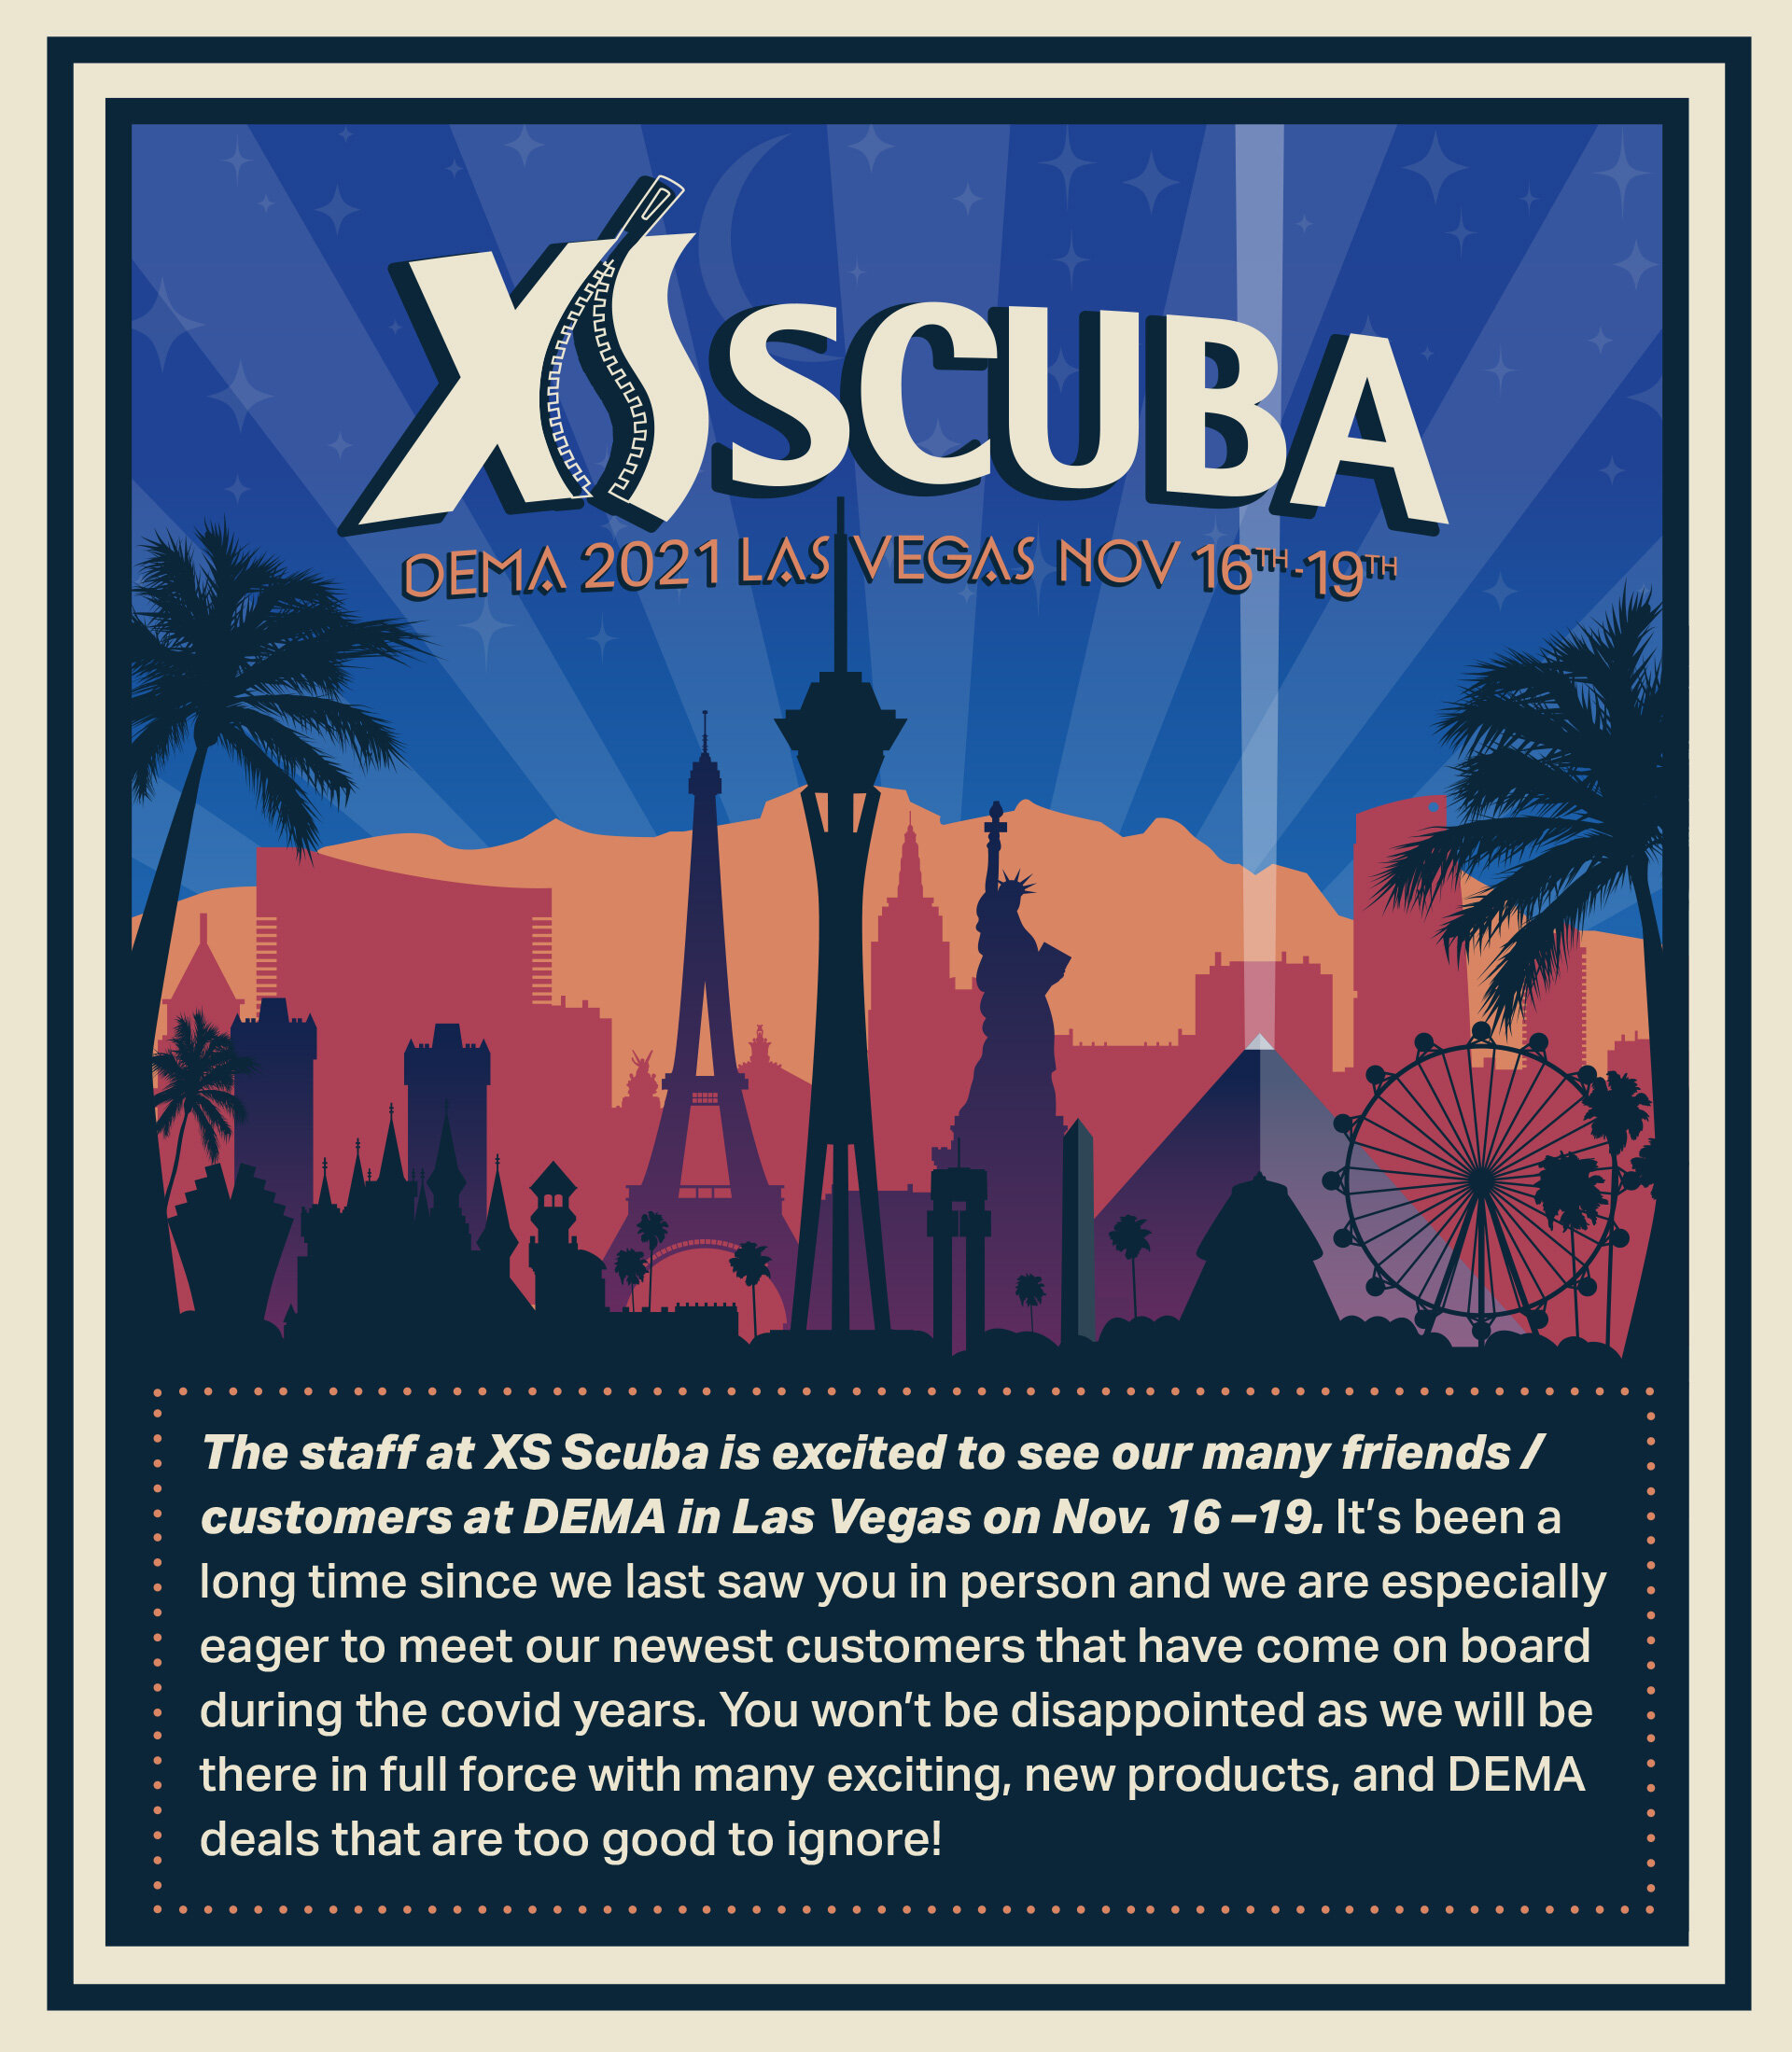 XS Scuba DEMA 2021